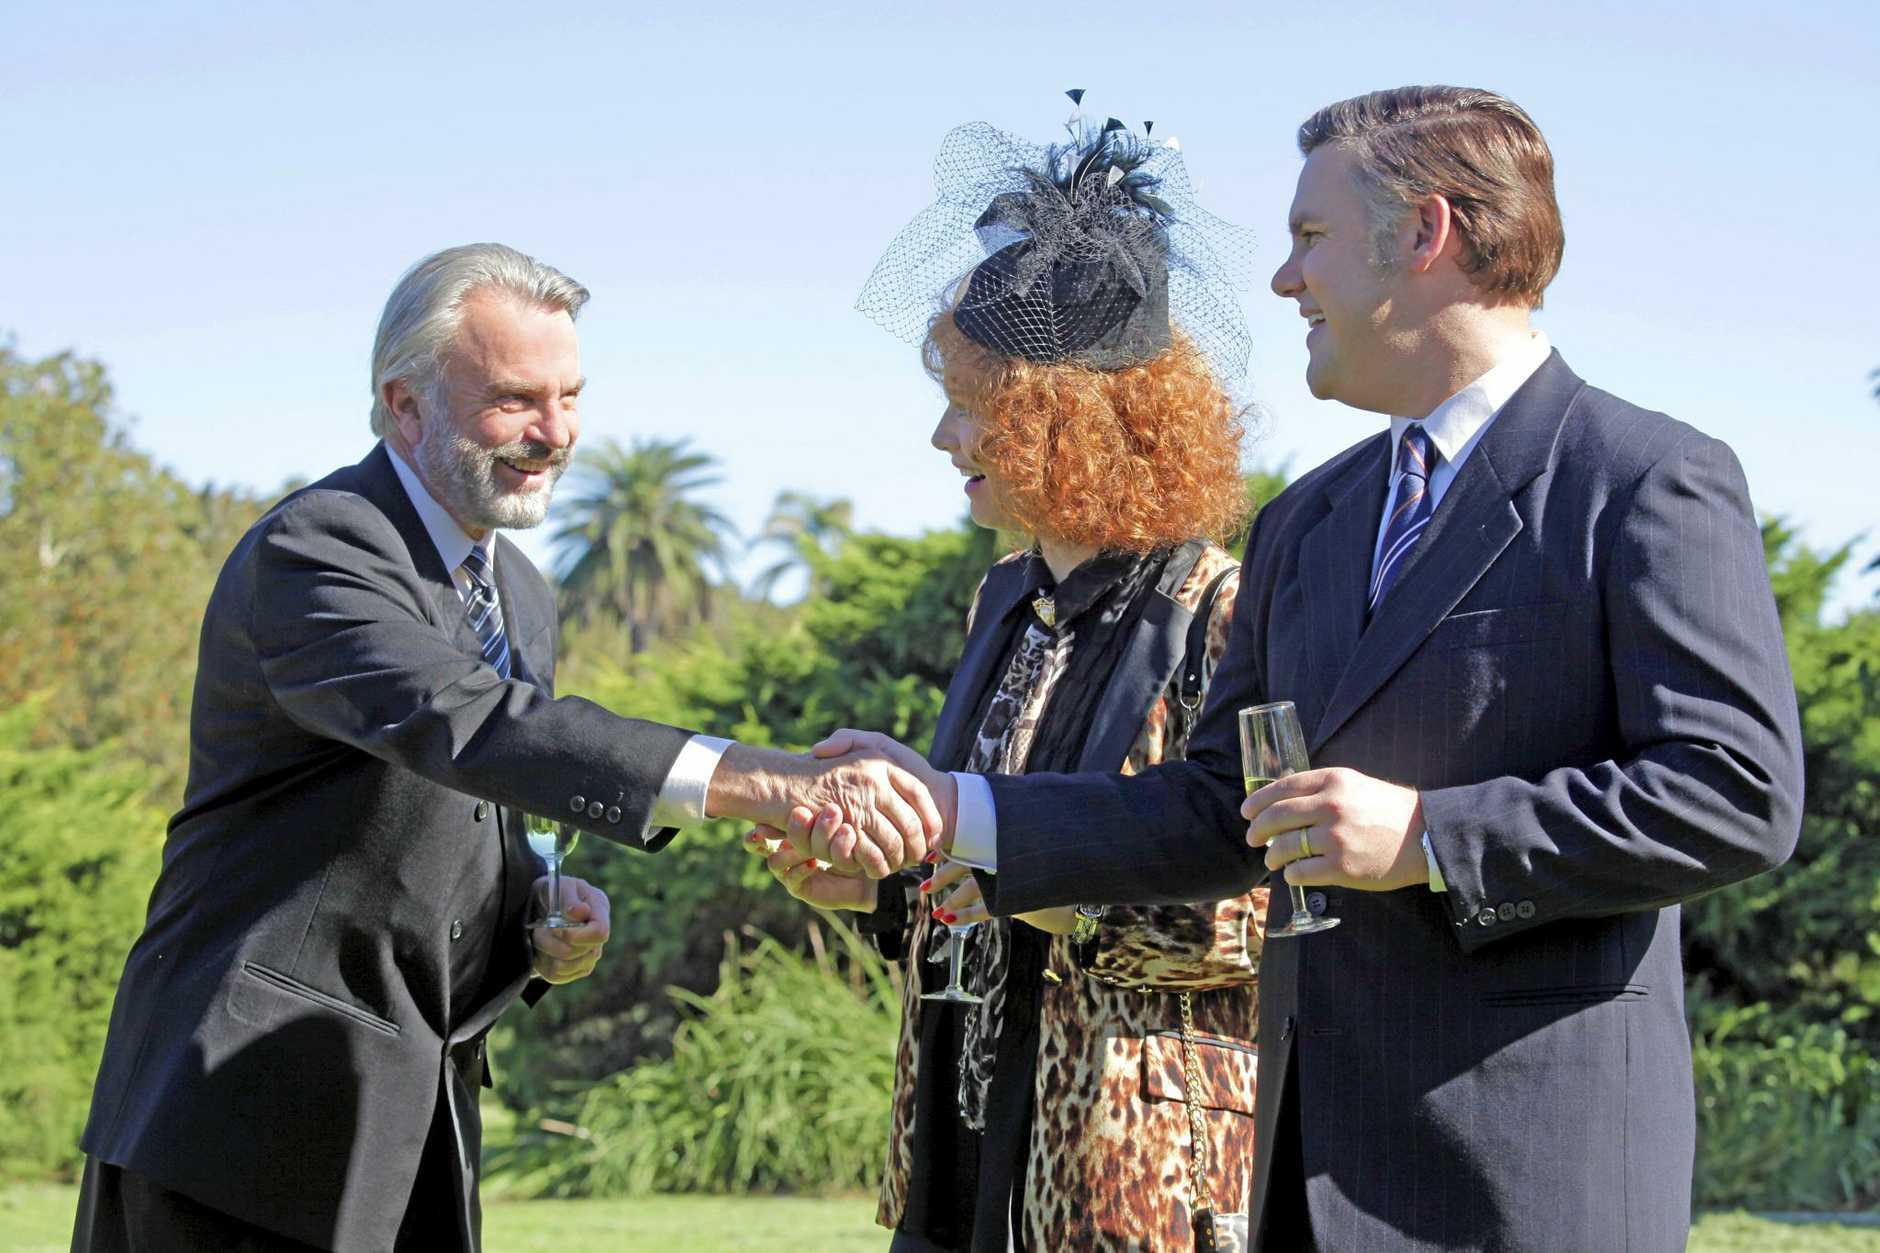 Sam Neill as Tiny Rowland, Adrienne Pickering as Eileen Bond and Ben Mingay as Alan Bond.